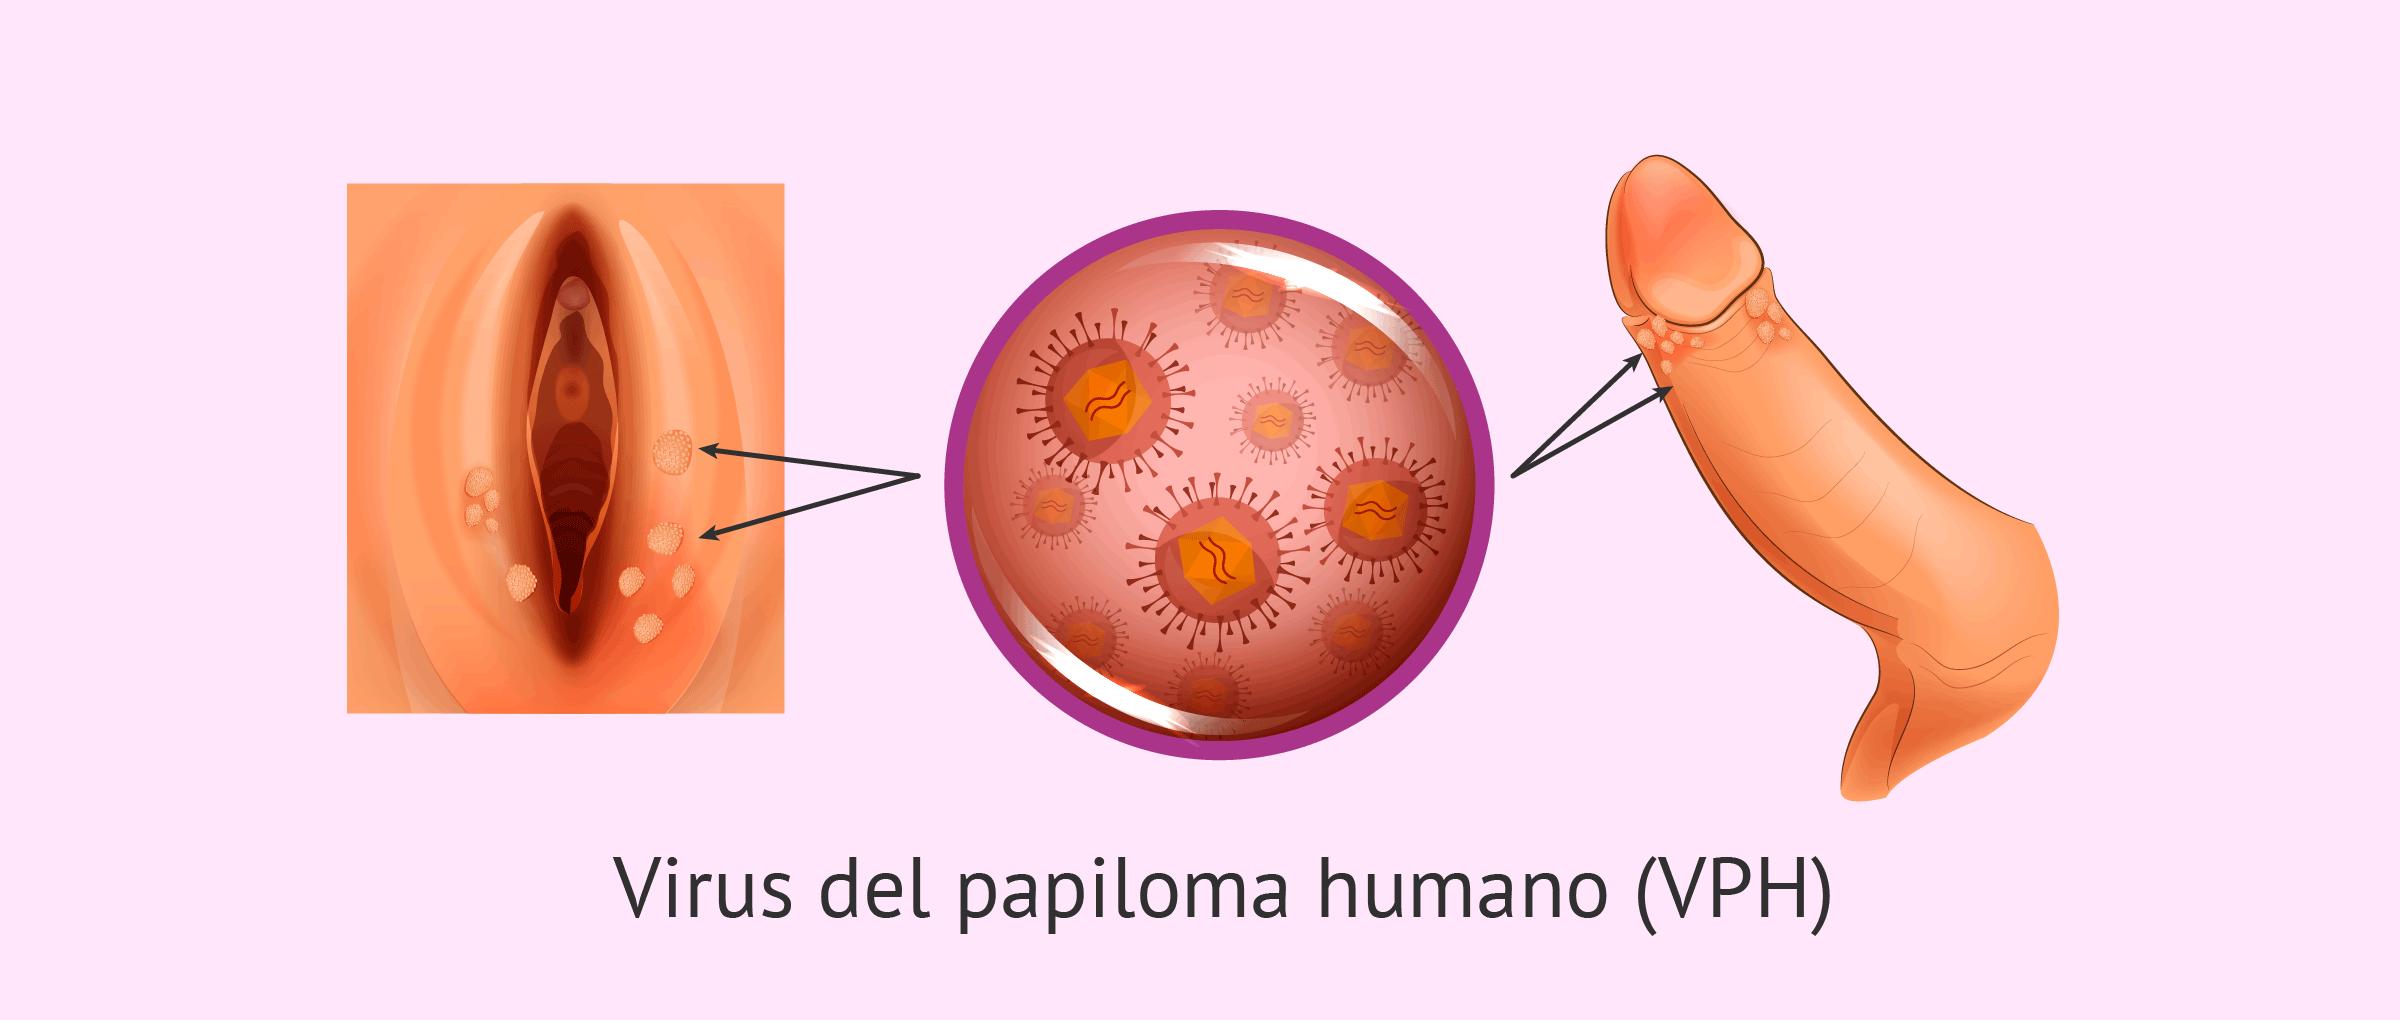 contagio de papiloma)